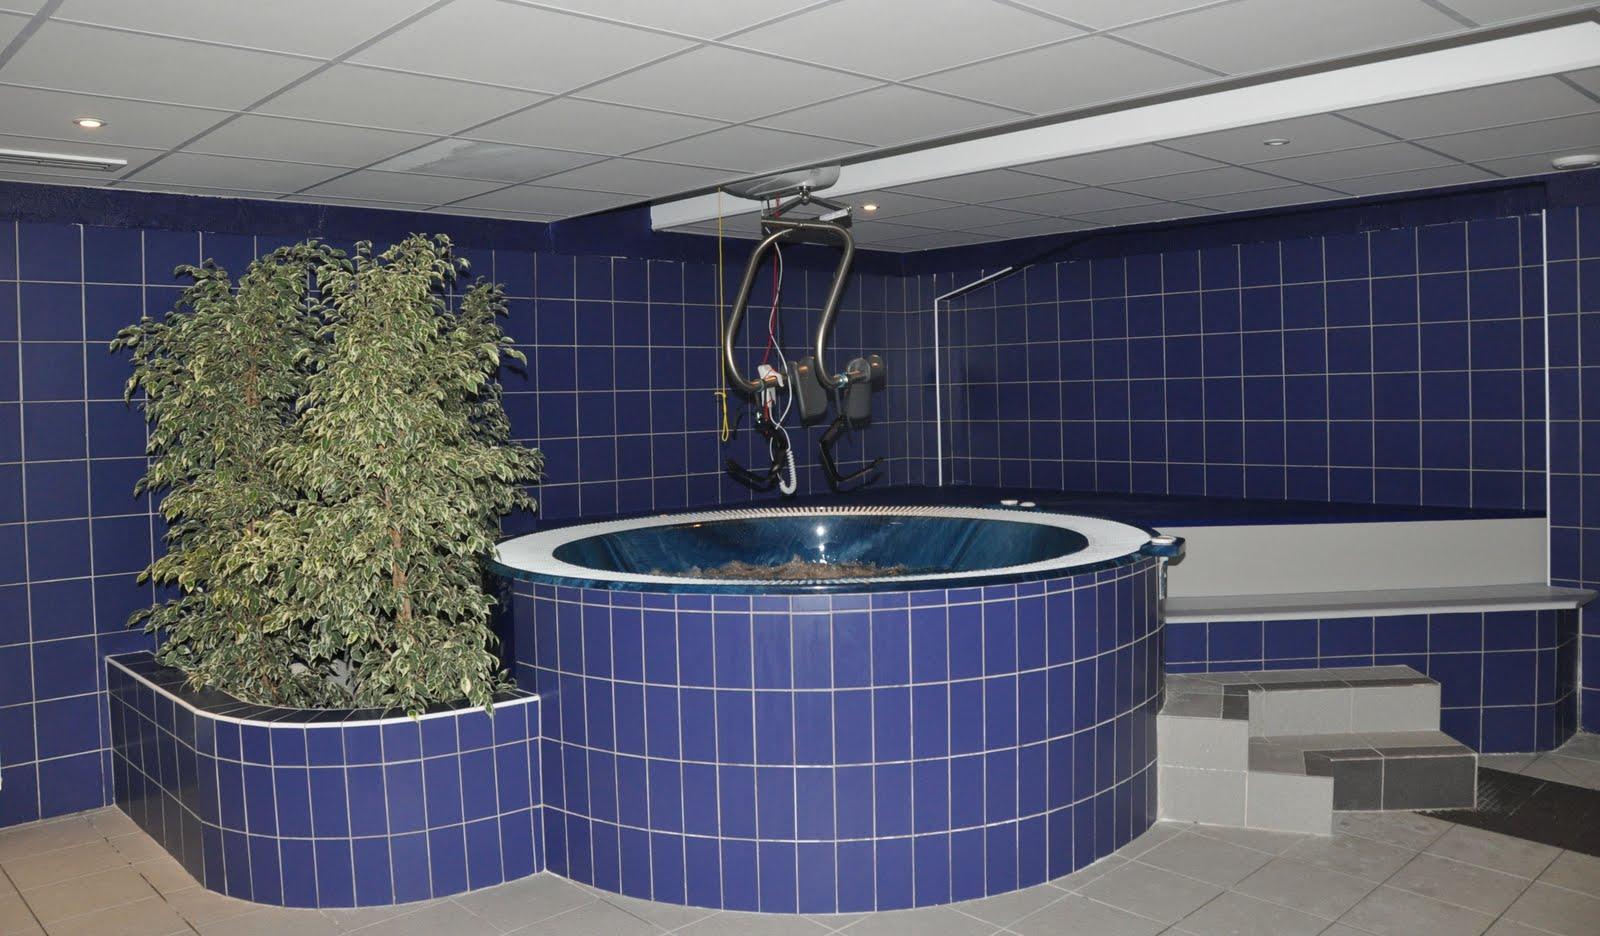 Azurevents06 inauguration des amenagements de la piscine jean medecin nice le 16 10 2010 - Piscine municipale cassis nice ...